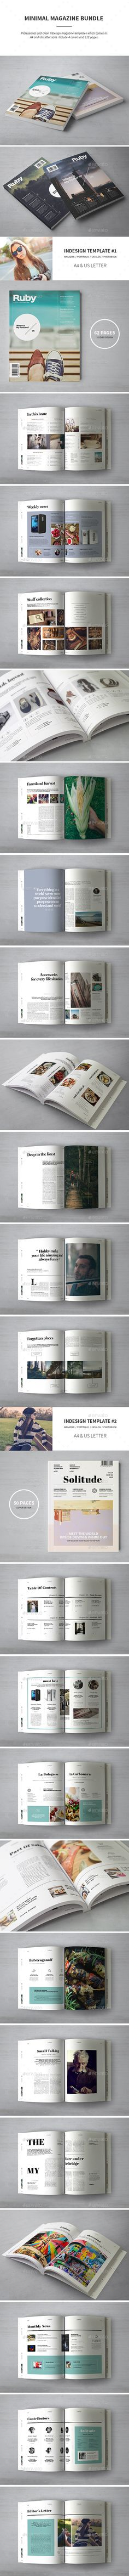 #Magazine Bundle - Magazines #Print #Templates Download here: https://graphicriver.net/item/magazine-bundle/18522956?ref=alena994